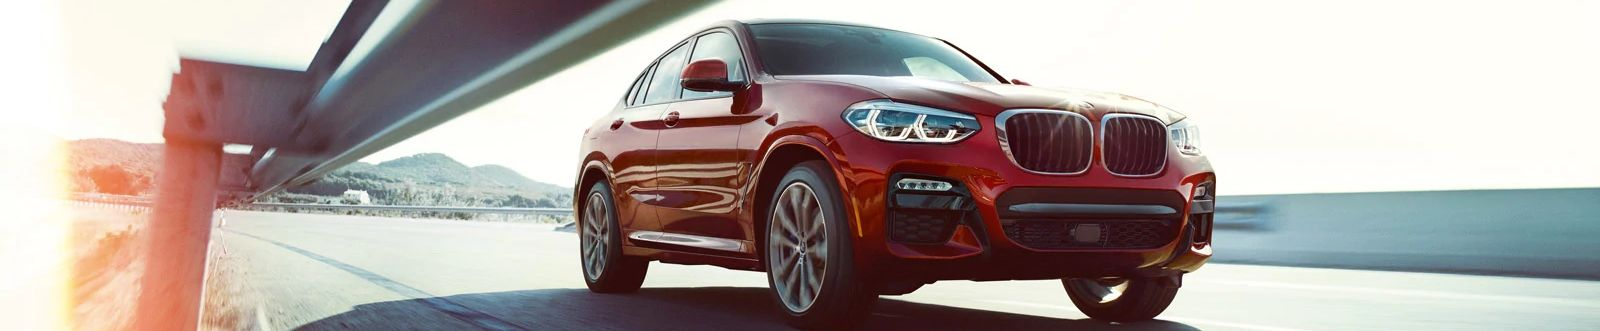 2019 BMW X4 for Sale near Grapevine, TX